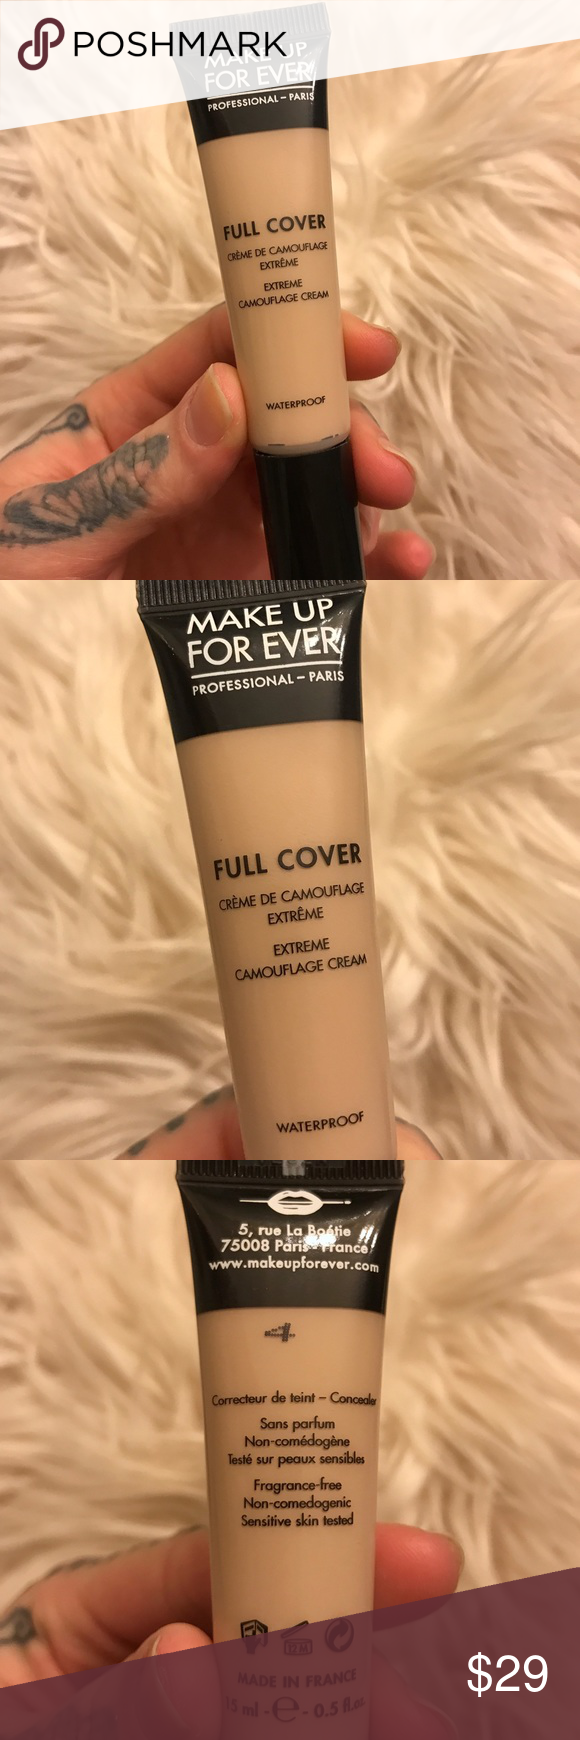 BRAND NEW MAKE UP FOREVER Full Cover Concealer NWT